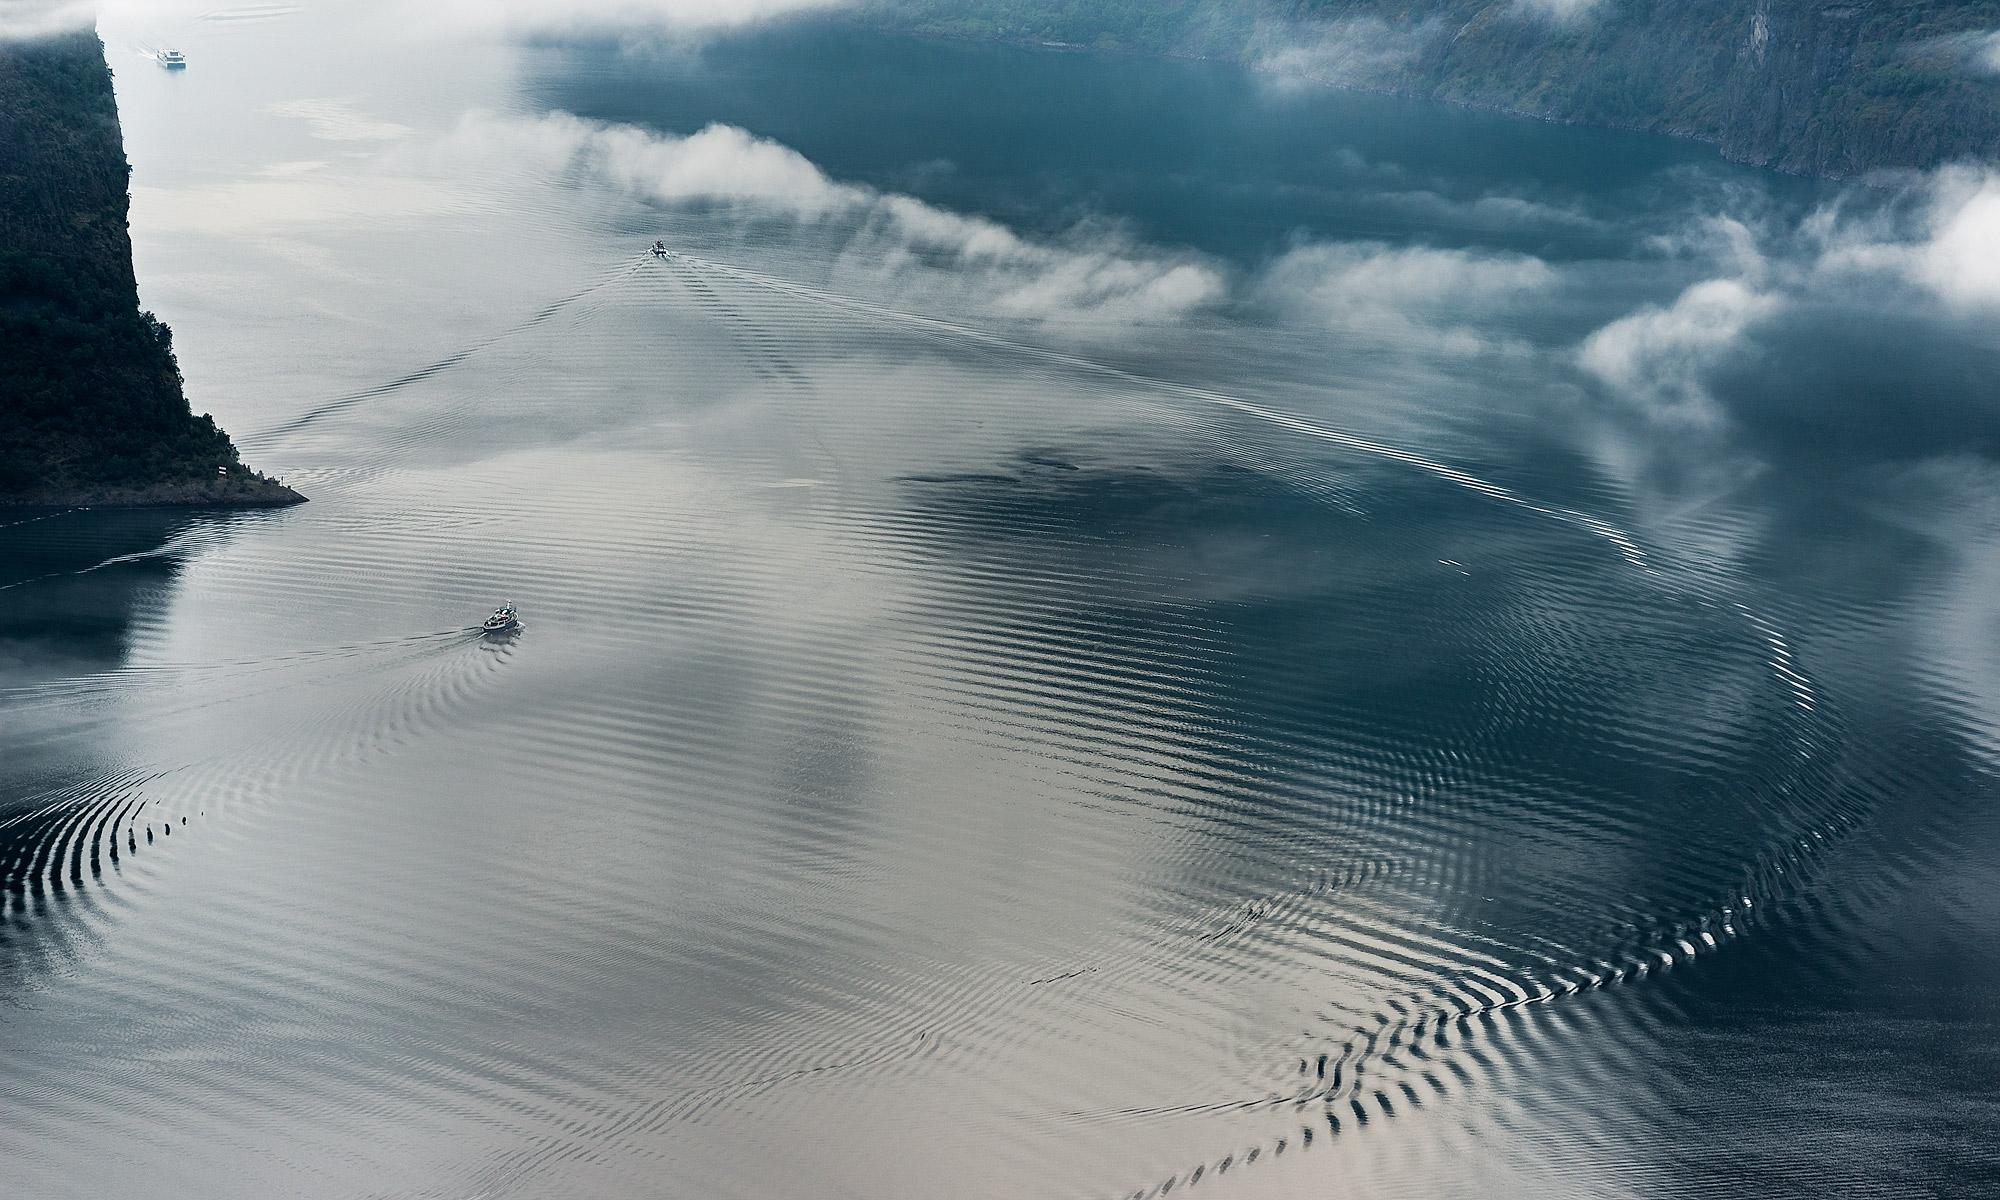 Boats on Aurlandsfjorden, Norway – Landscape Photography